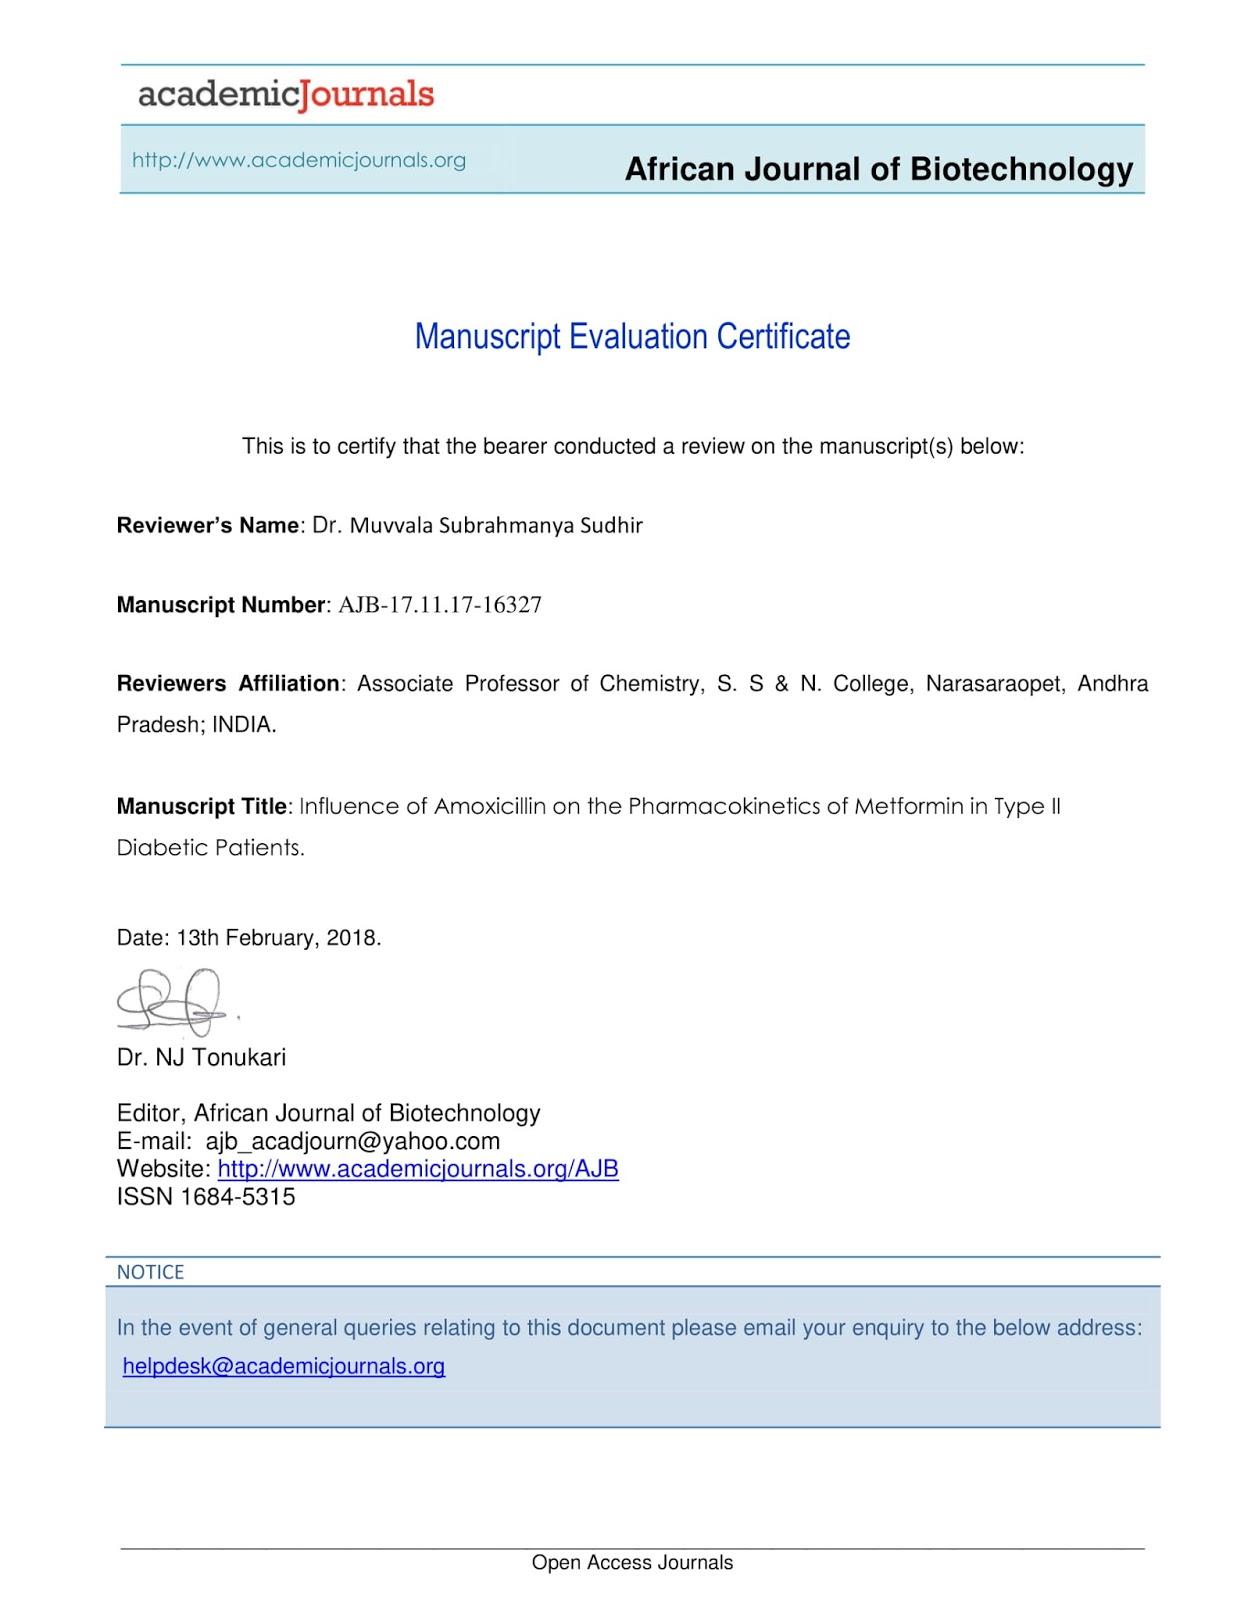 My Achievements 156 Manuscript Evaluation Certificate African